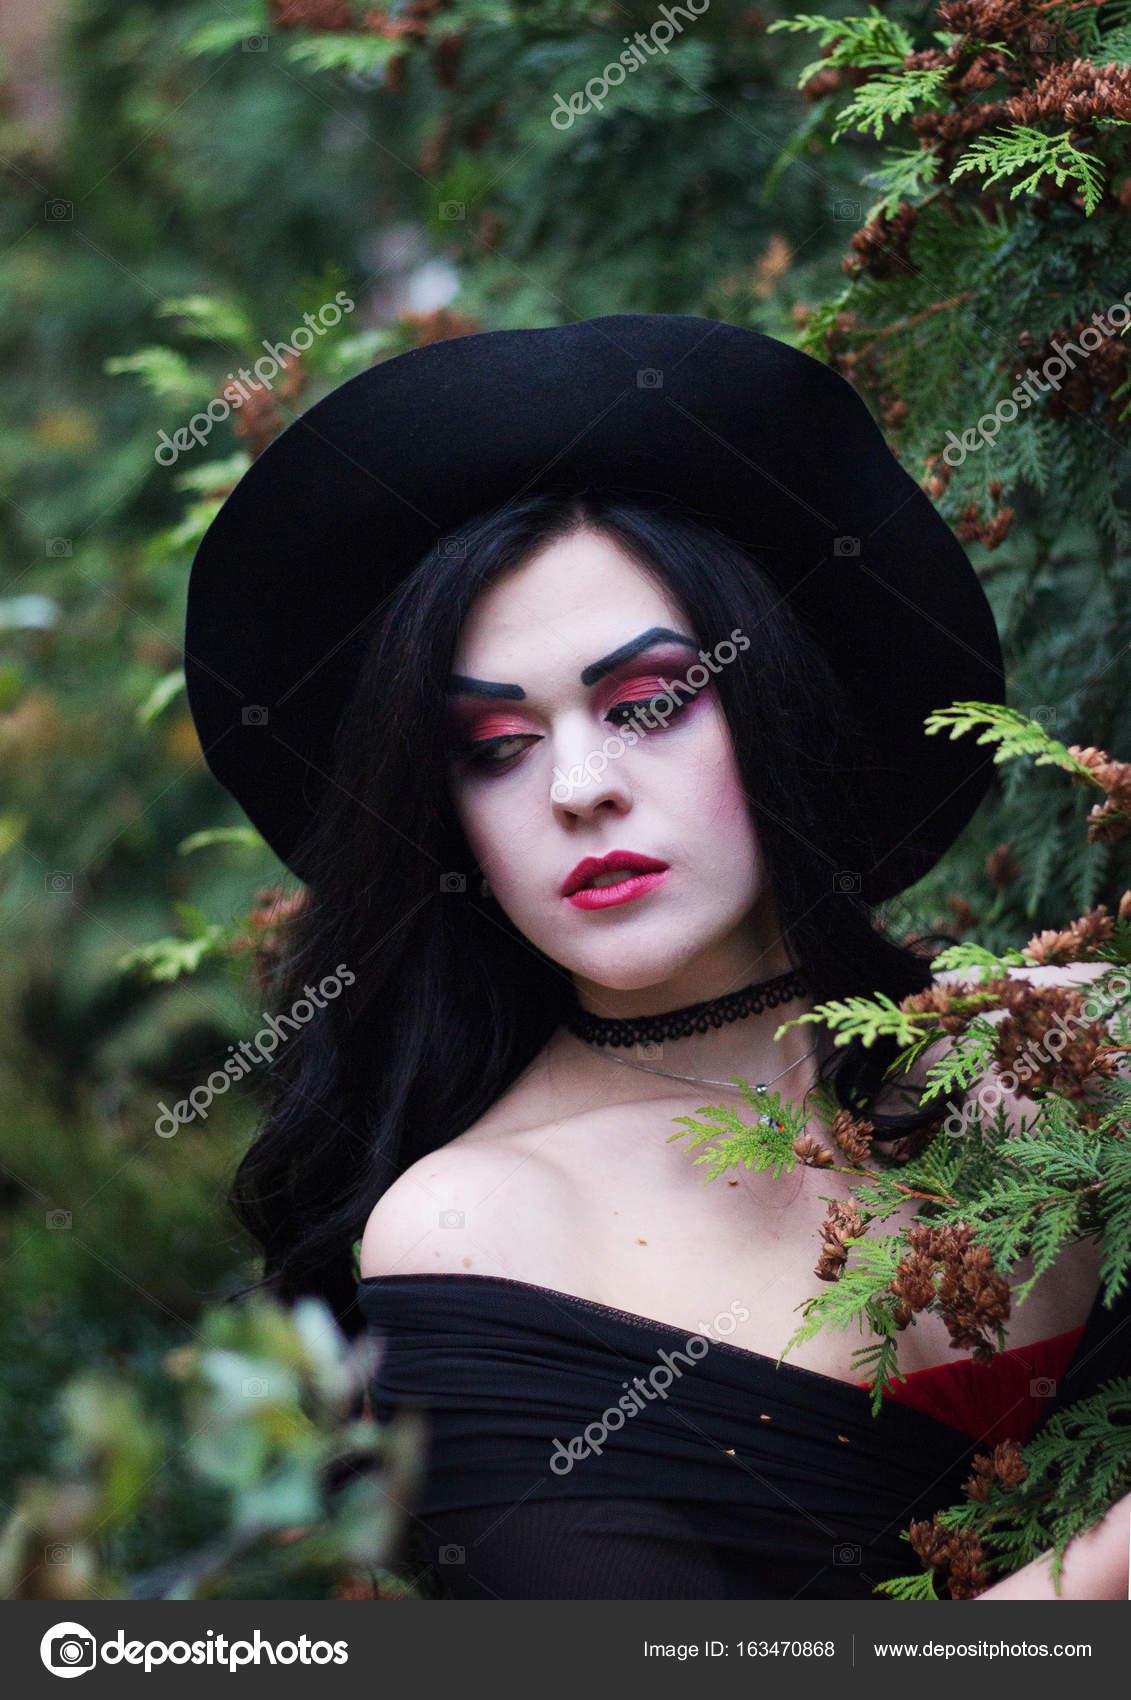 Trucco Halloween Yahoo.L Immagine Di Una Strega Per Halloween Foto Stock C Kirilyukrm